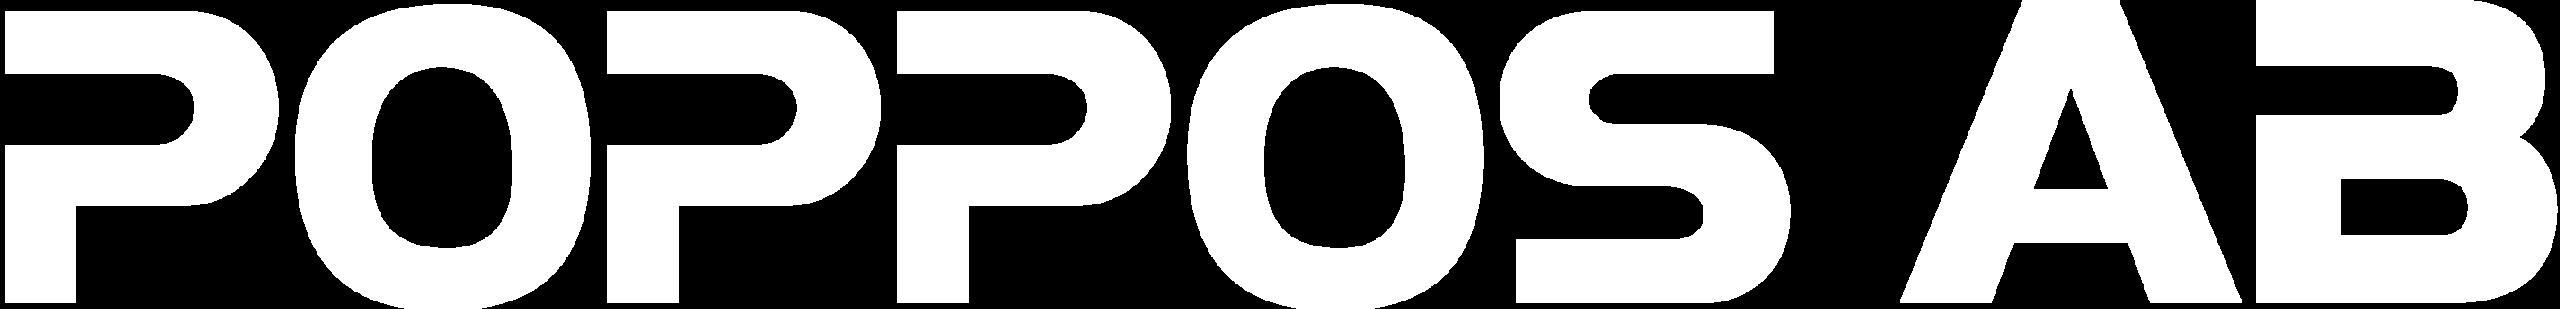 Poppos AB